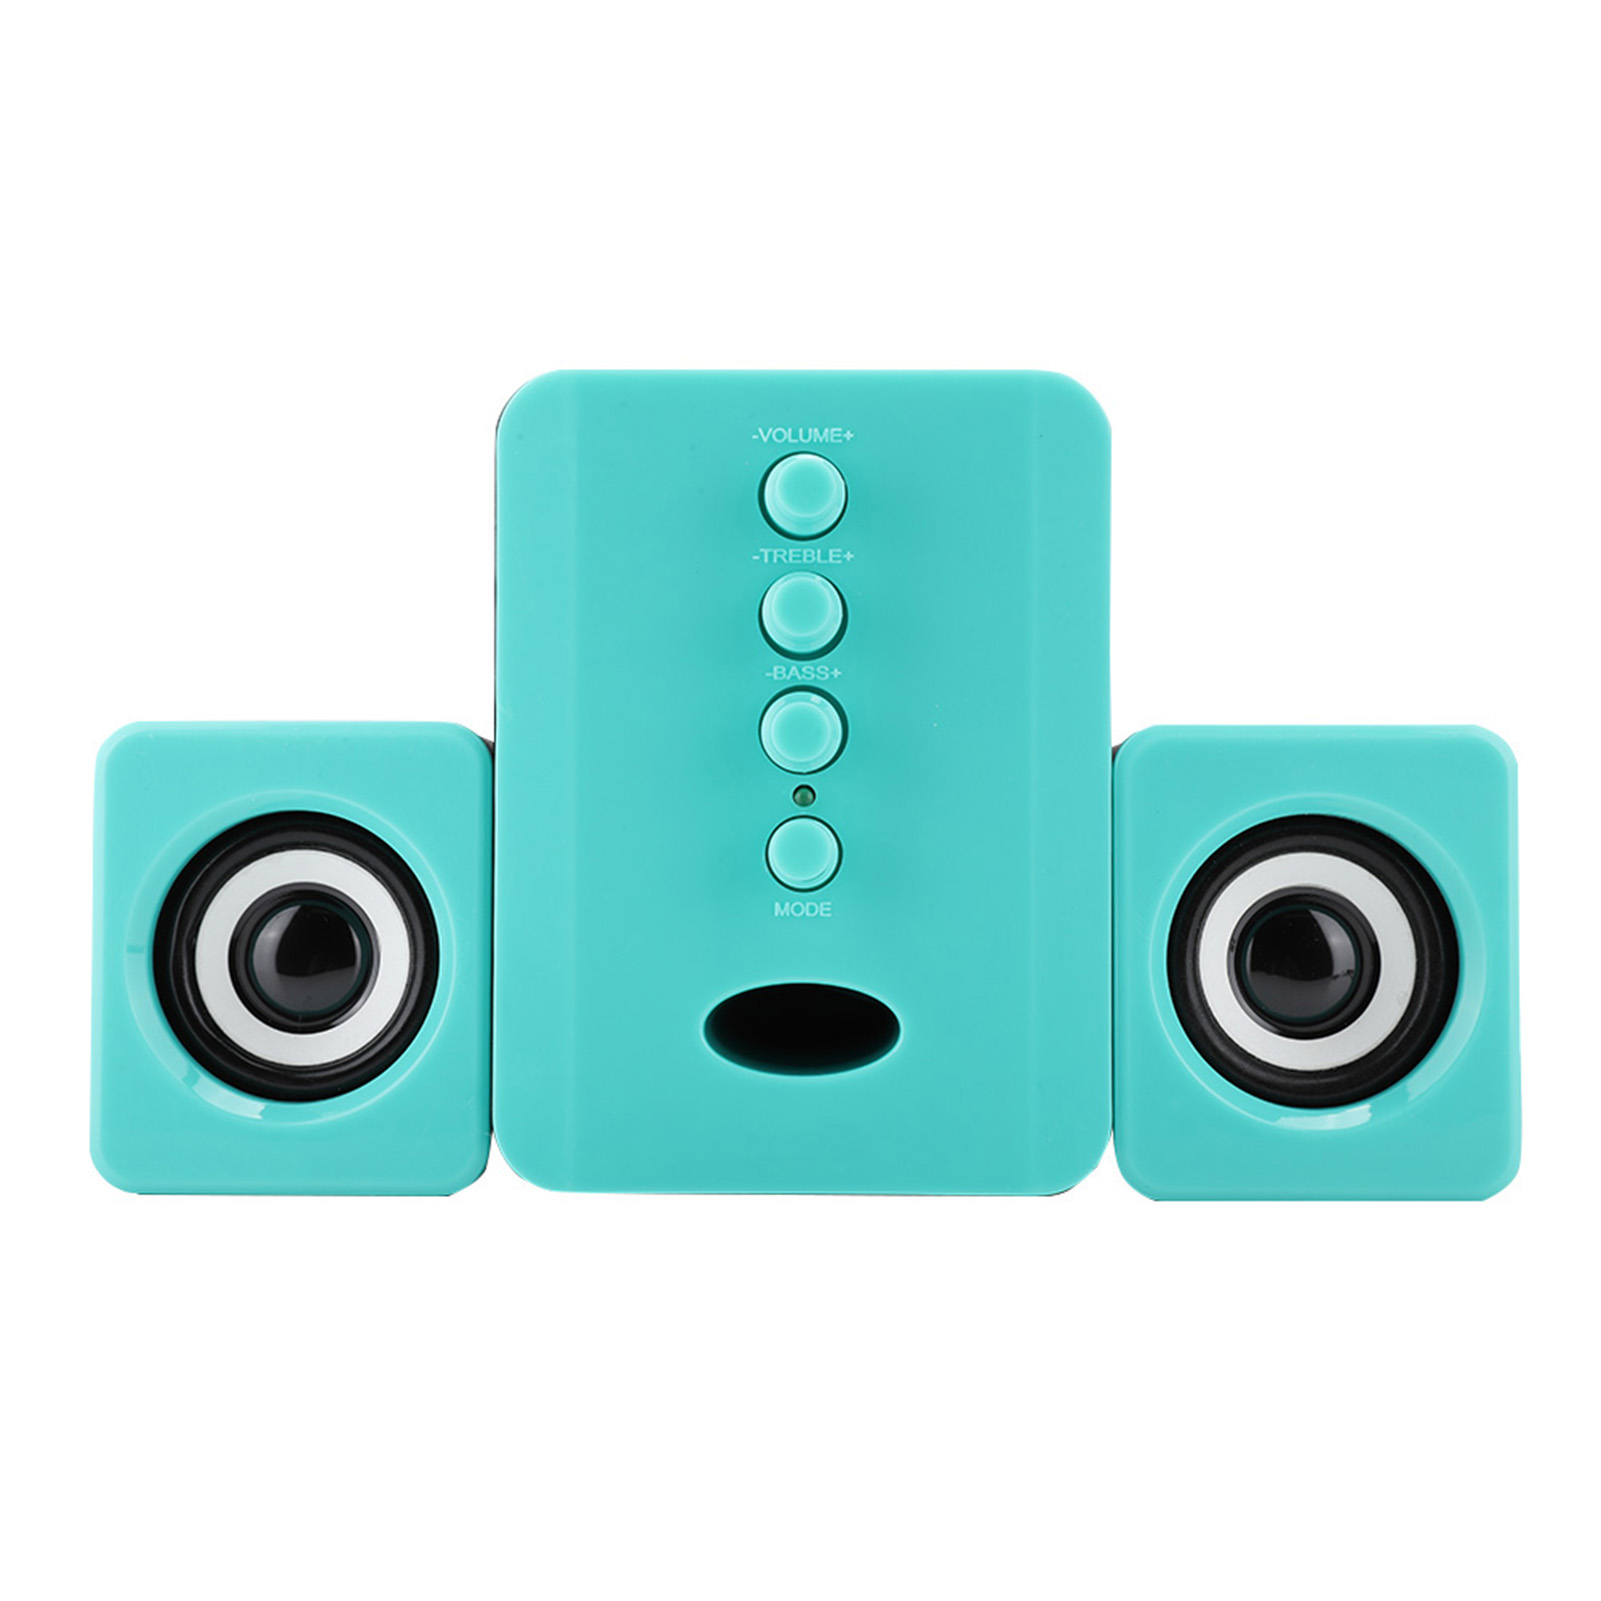 SADA-Bluetooth-Computer-Speaker-Desktop-Laptop-PC-Stereo-Subwoofer-Multimedia thumbnail 83